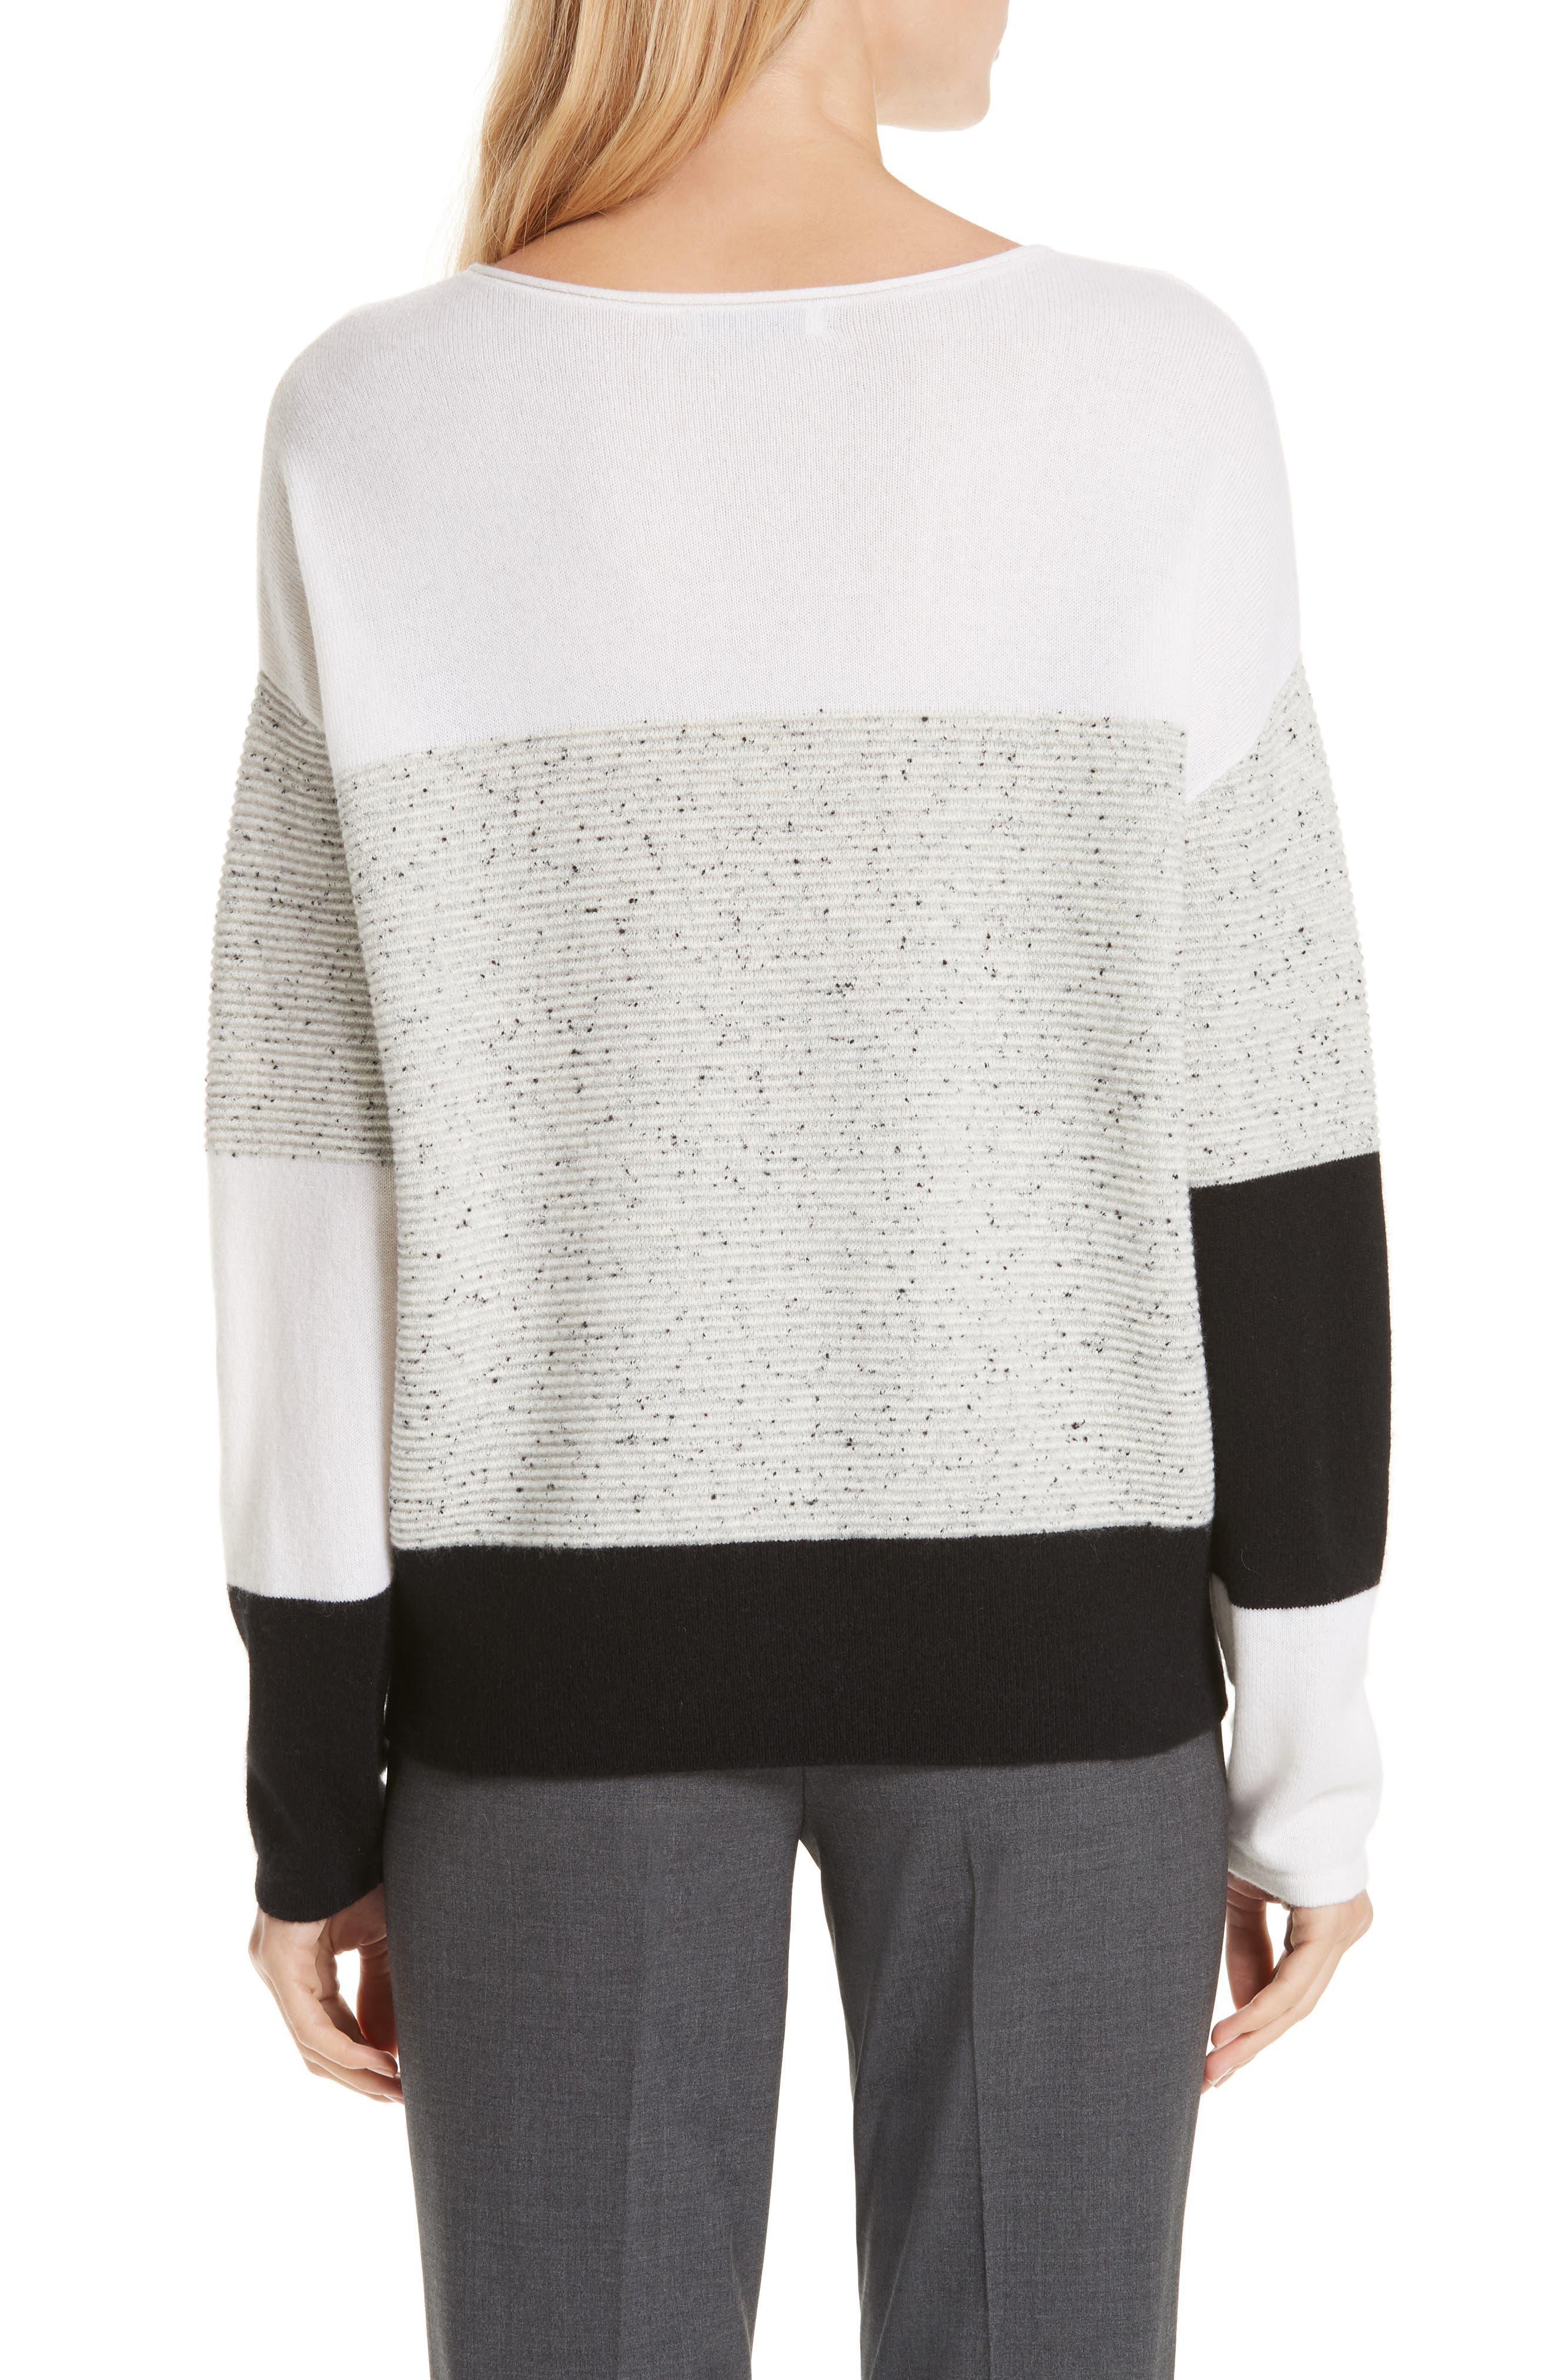 Colorblock Cashmere Sweater,                             Alternate thumbnail 2, color,                             IVORY SOFT MULTI COLOR BLOCK